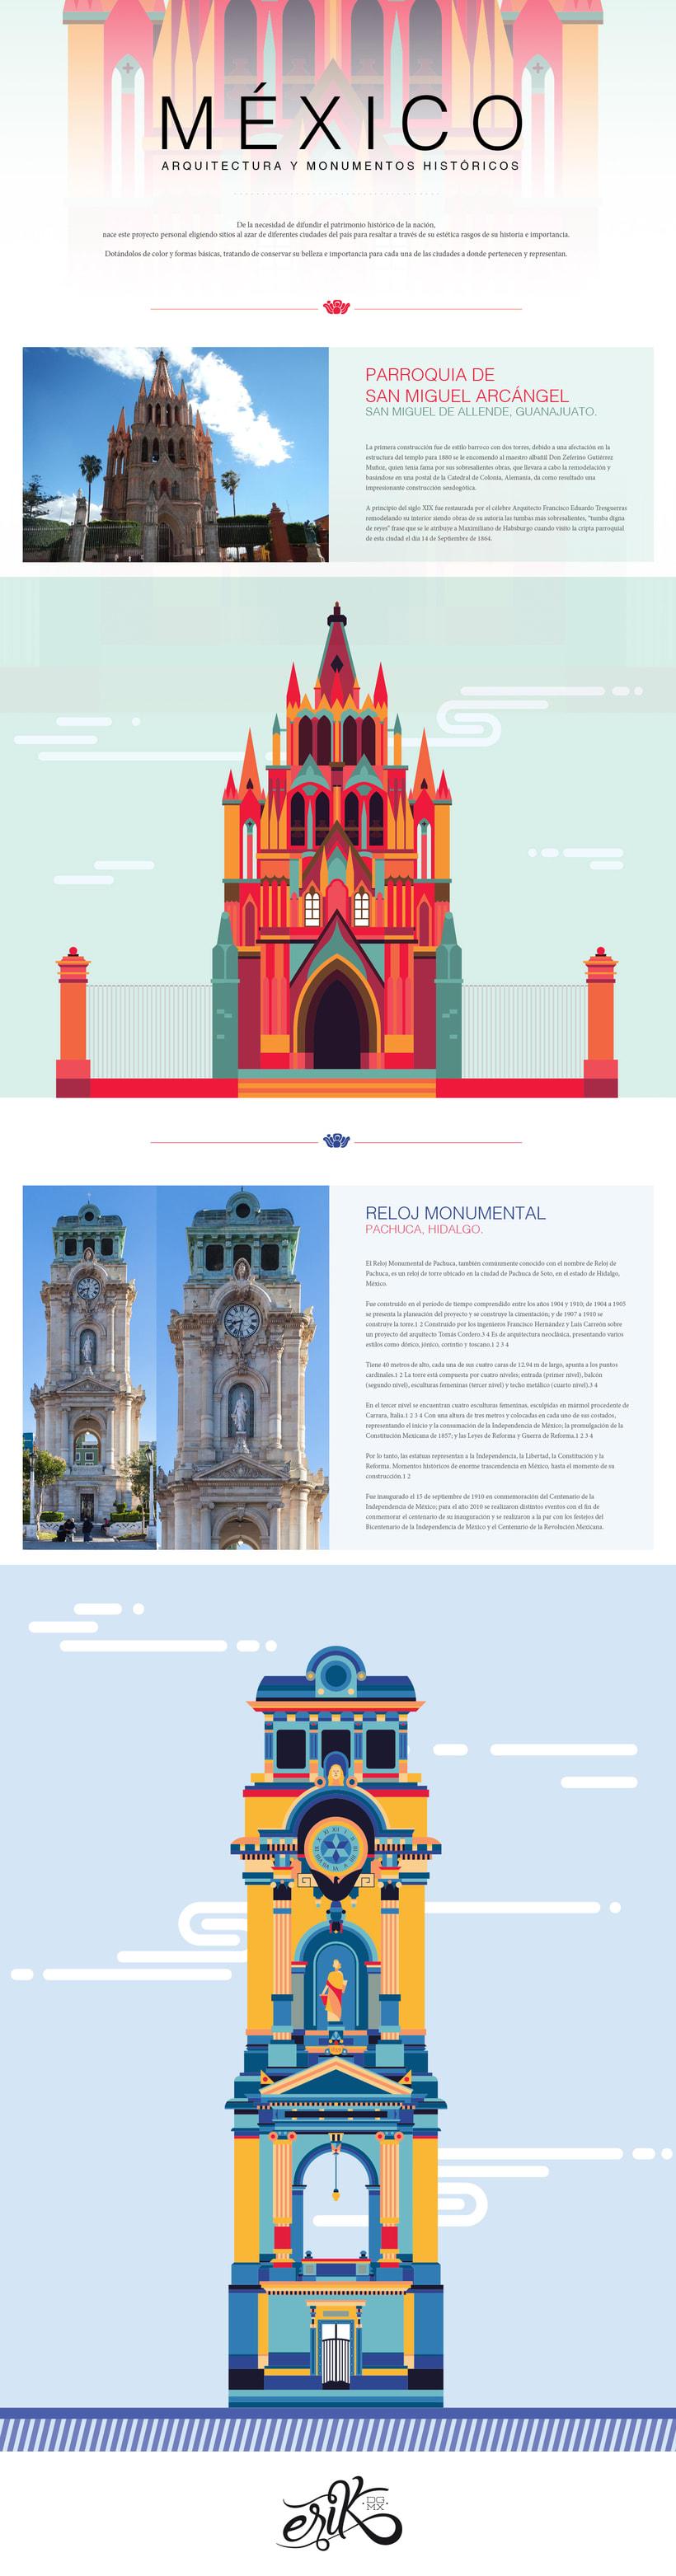 México, arquitectura y monumentos II -1